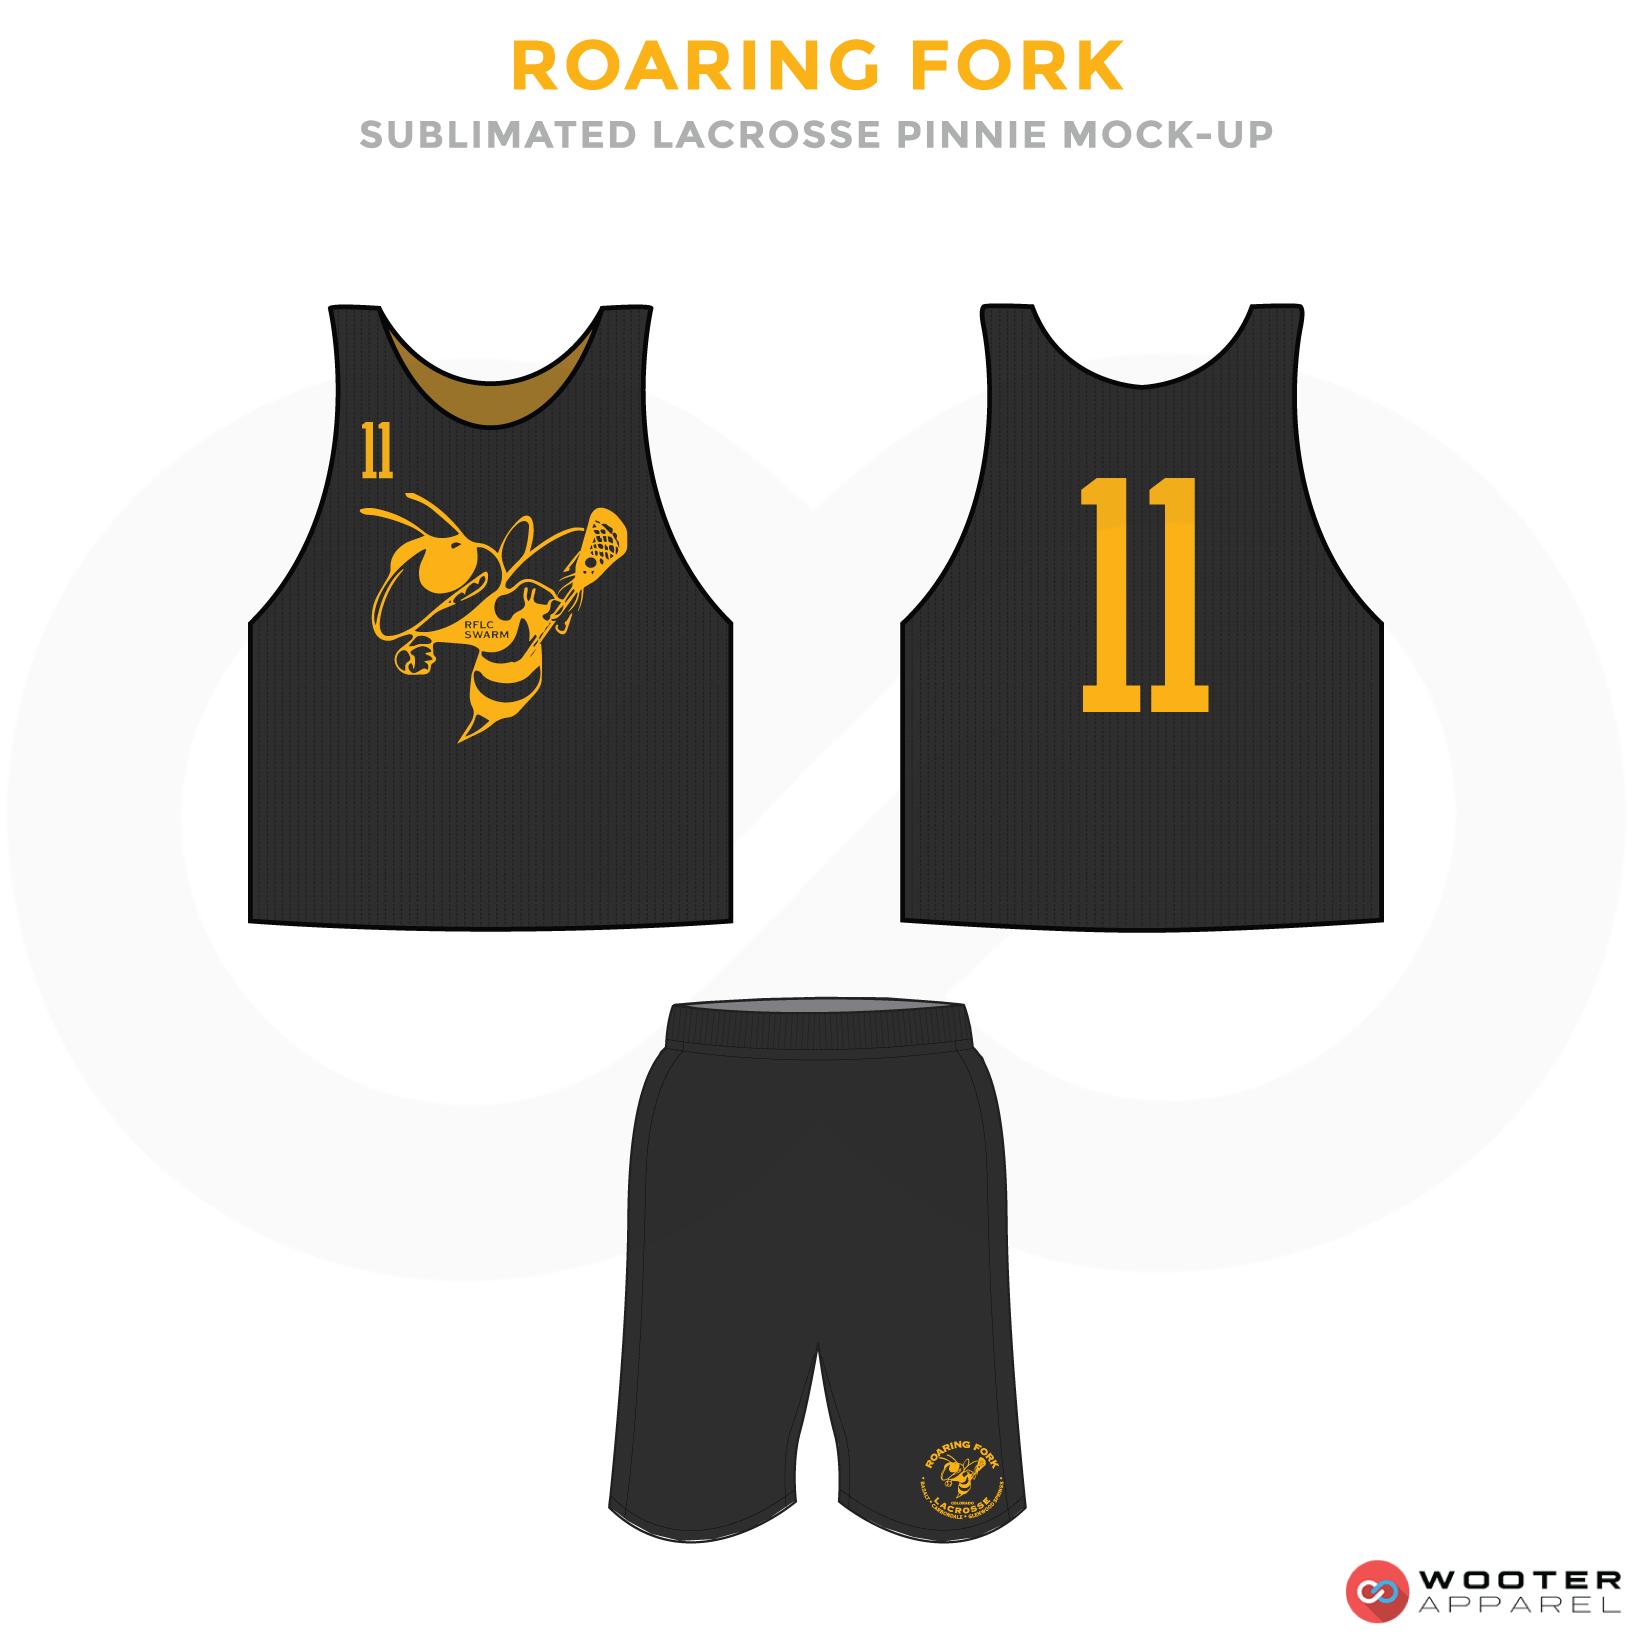 Roaring Fork Black and Yellow Lacrosse Uniforms, Reversible Pinnies, Jerseys, Shorts